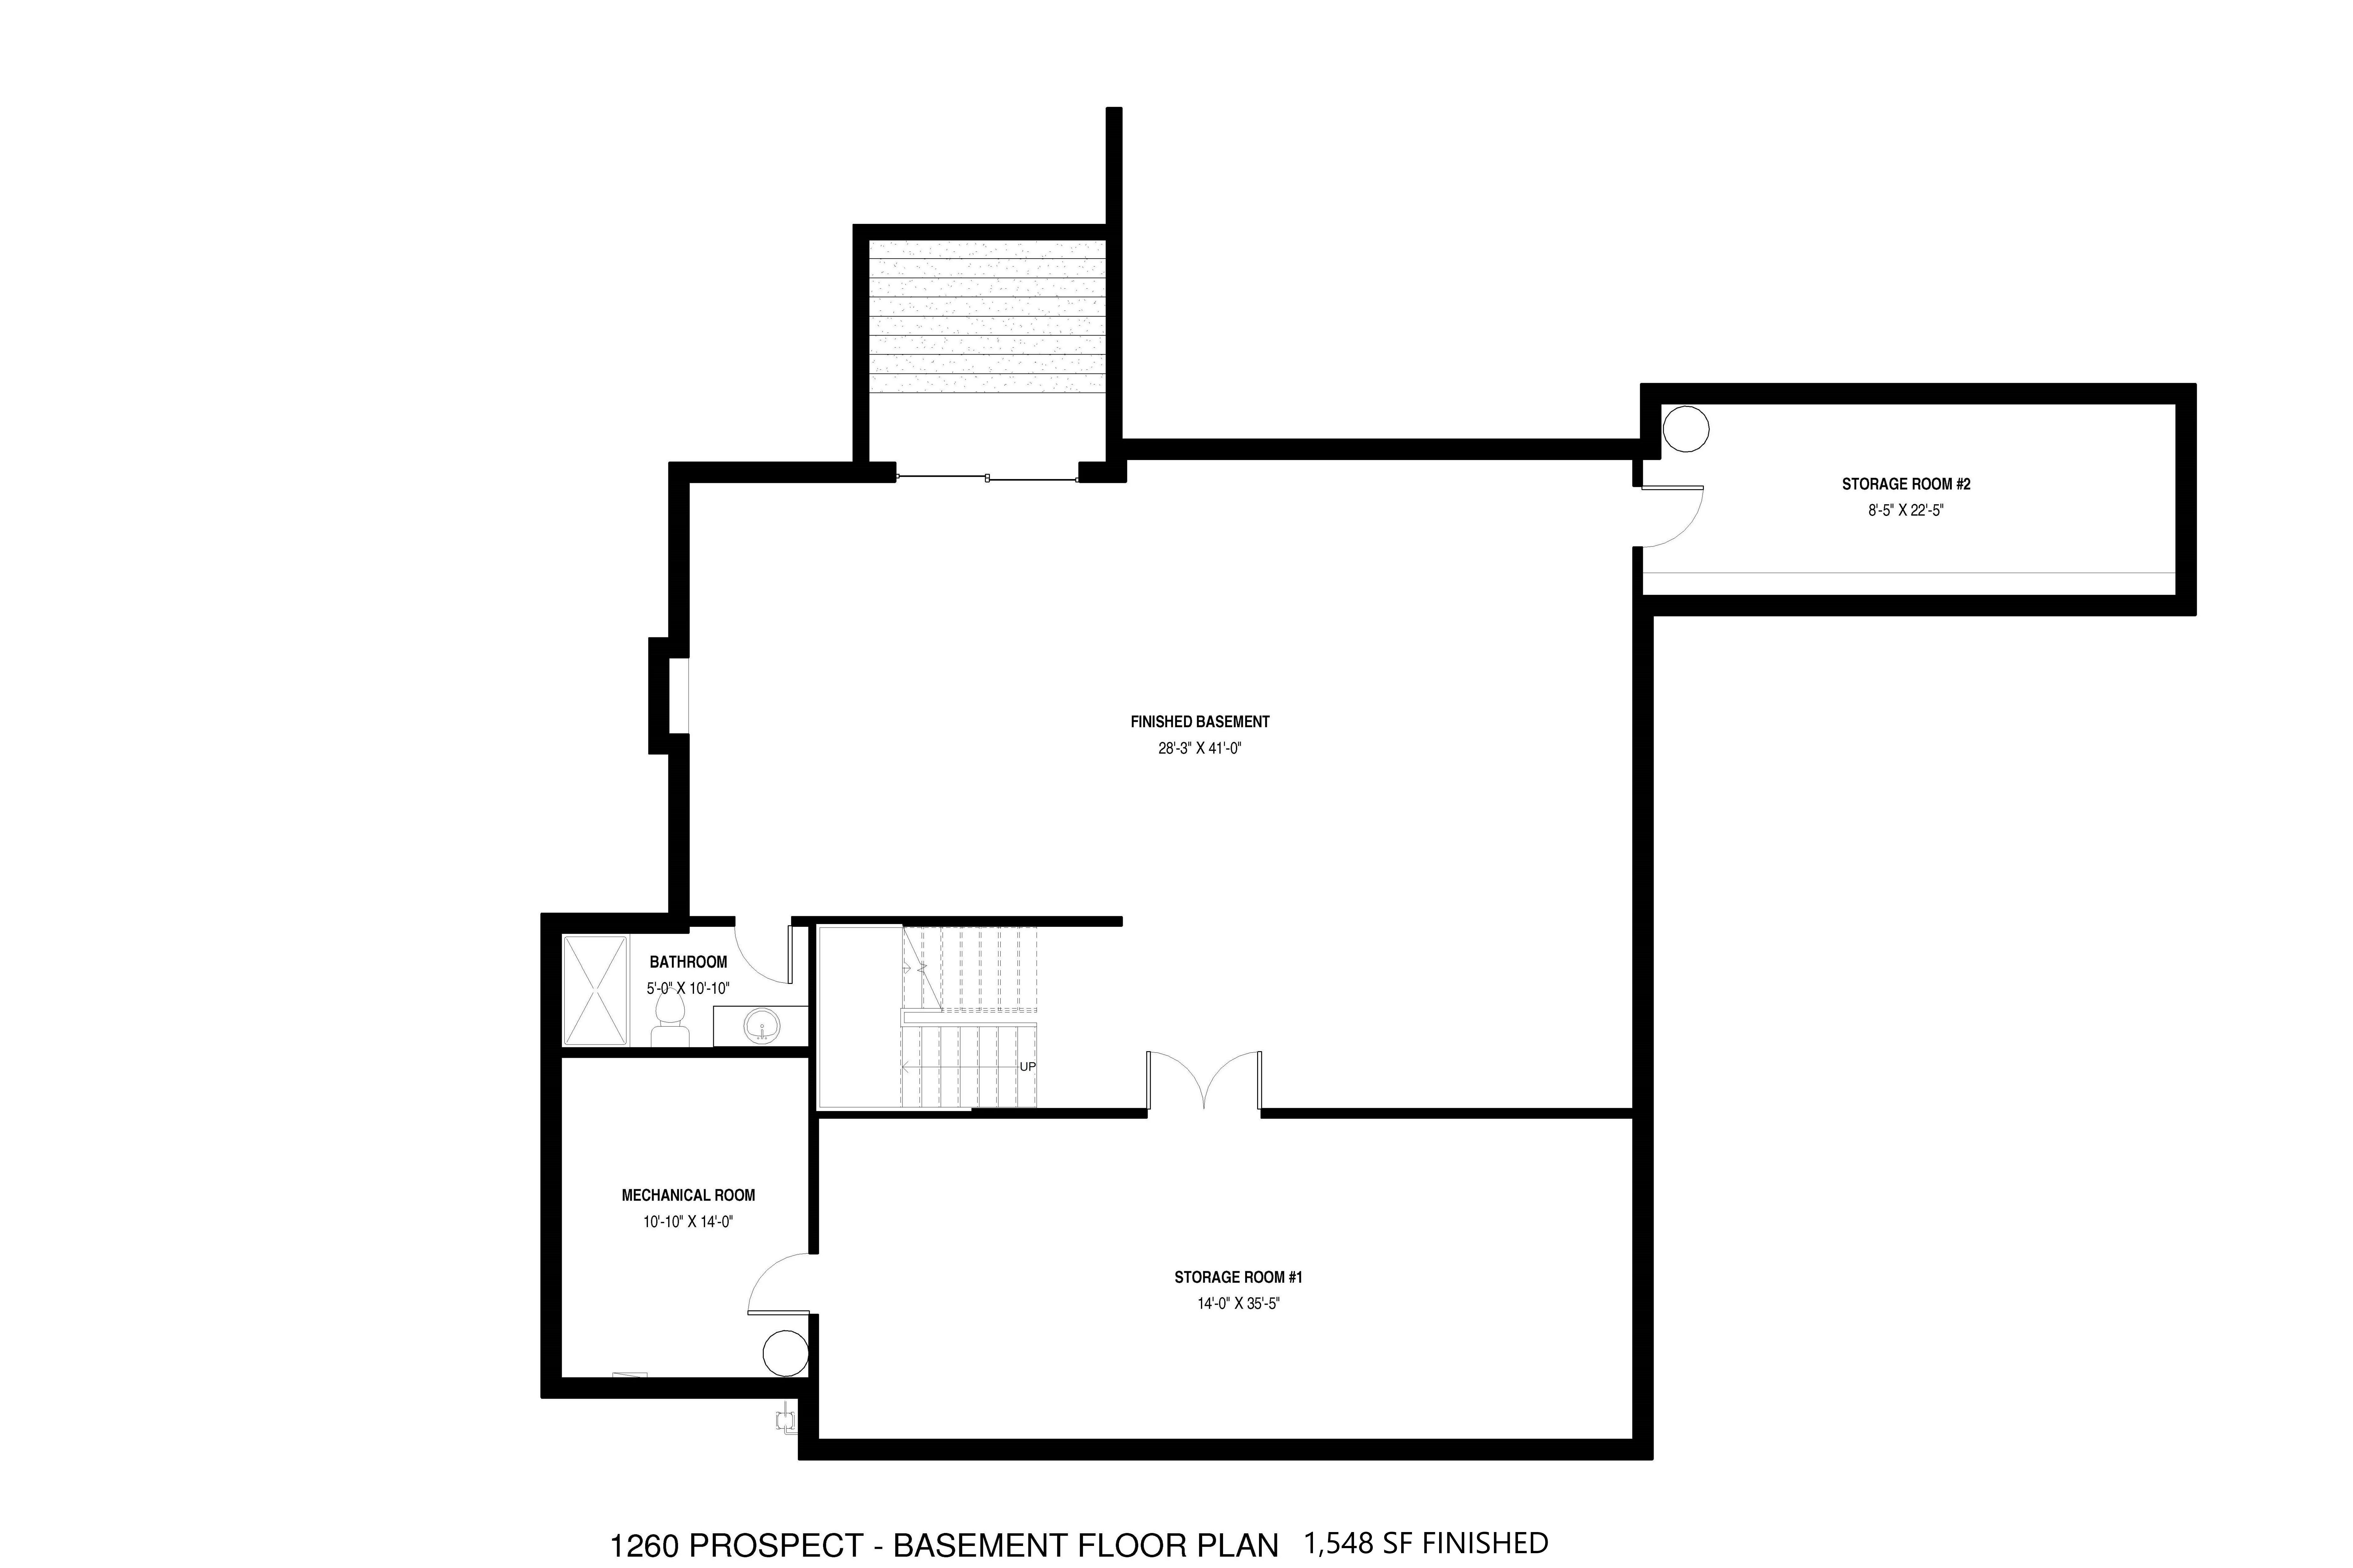 Finished Basement Floor Plan